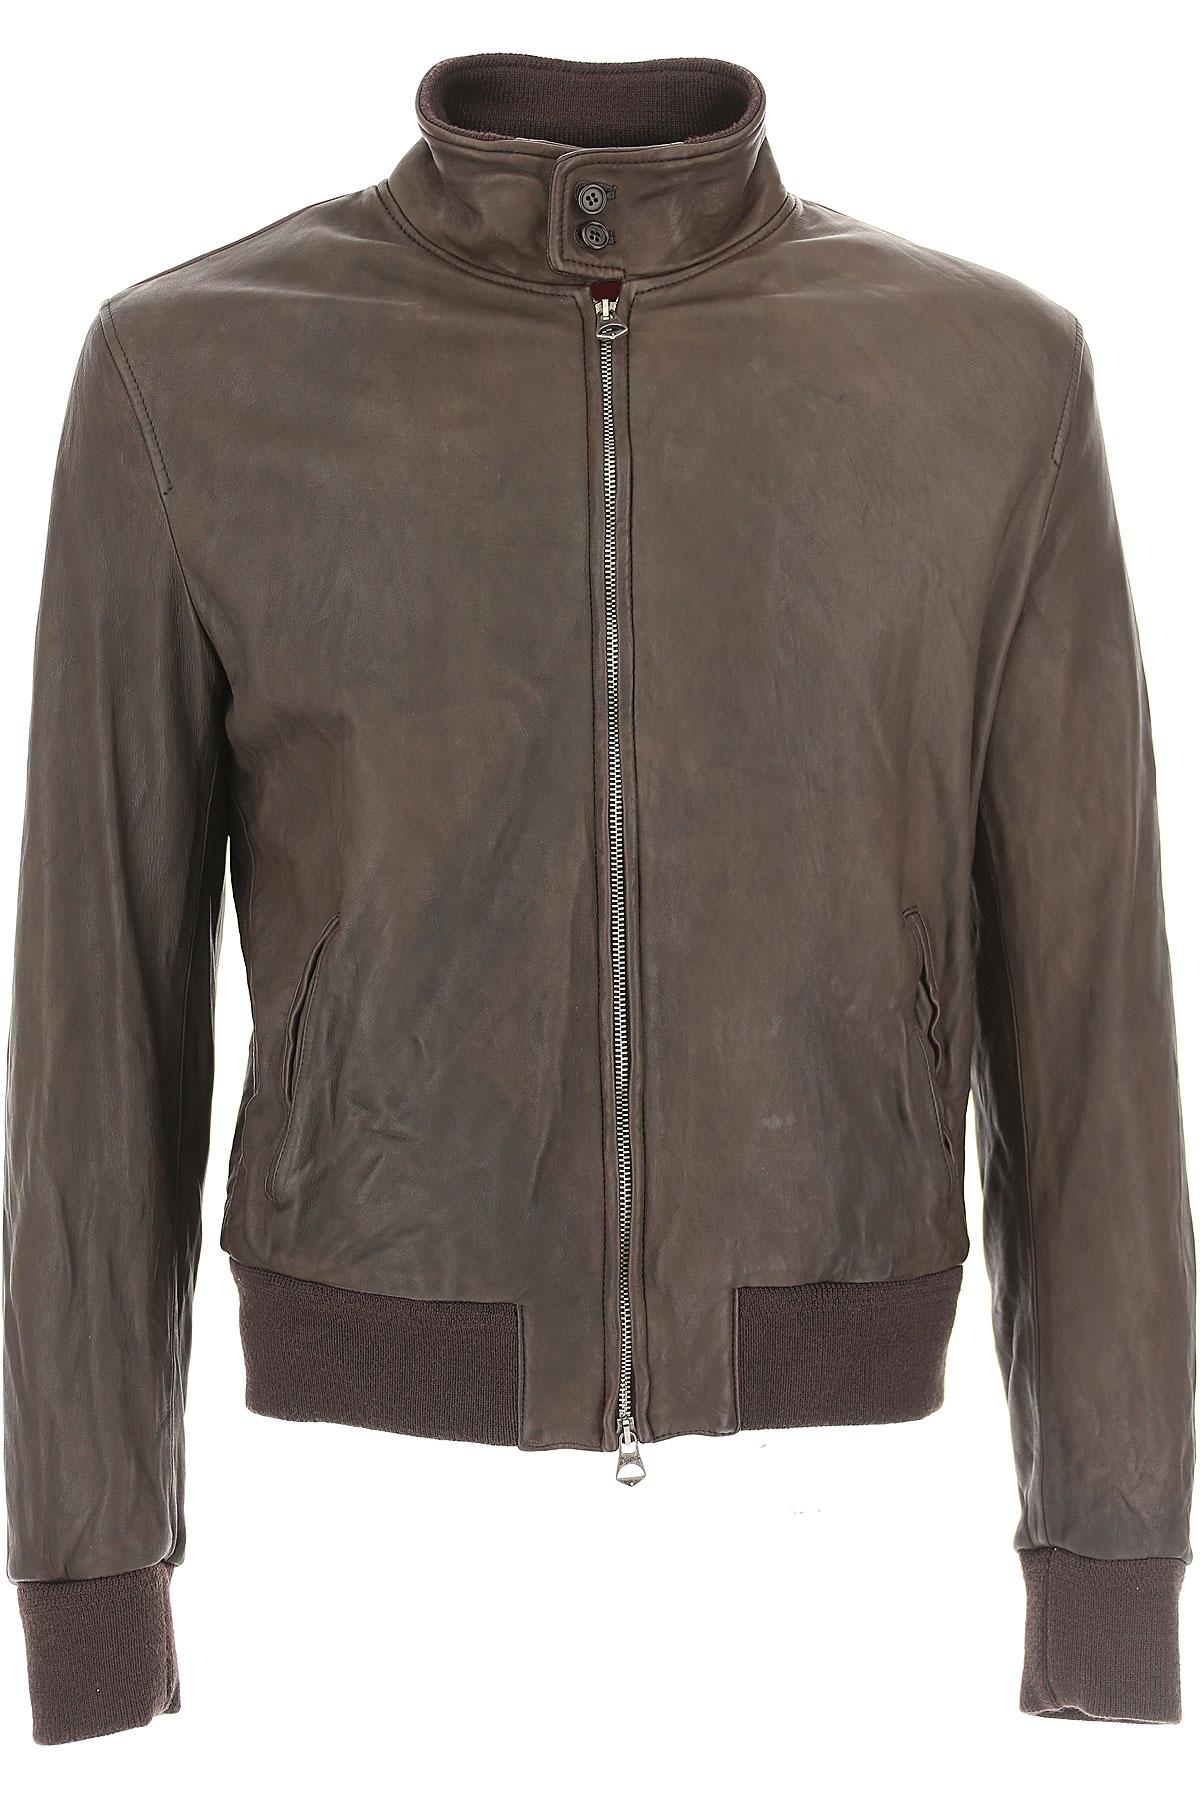 Image of Stewart Leather Jacket for Men, Dark Brown, Leather, 2017, L M XL XXL